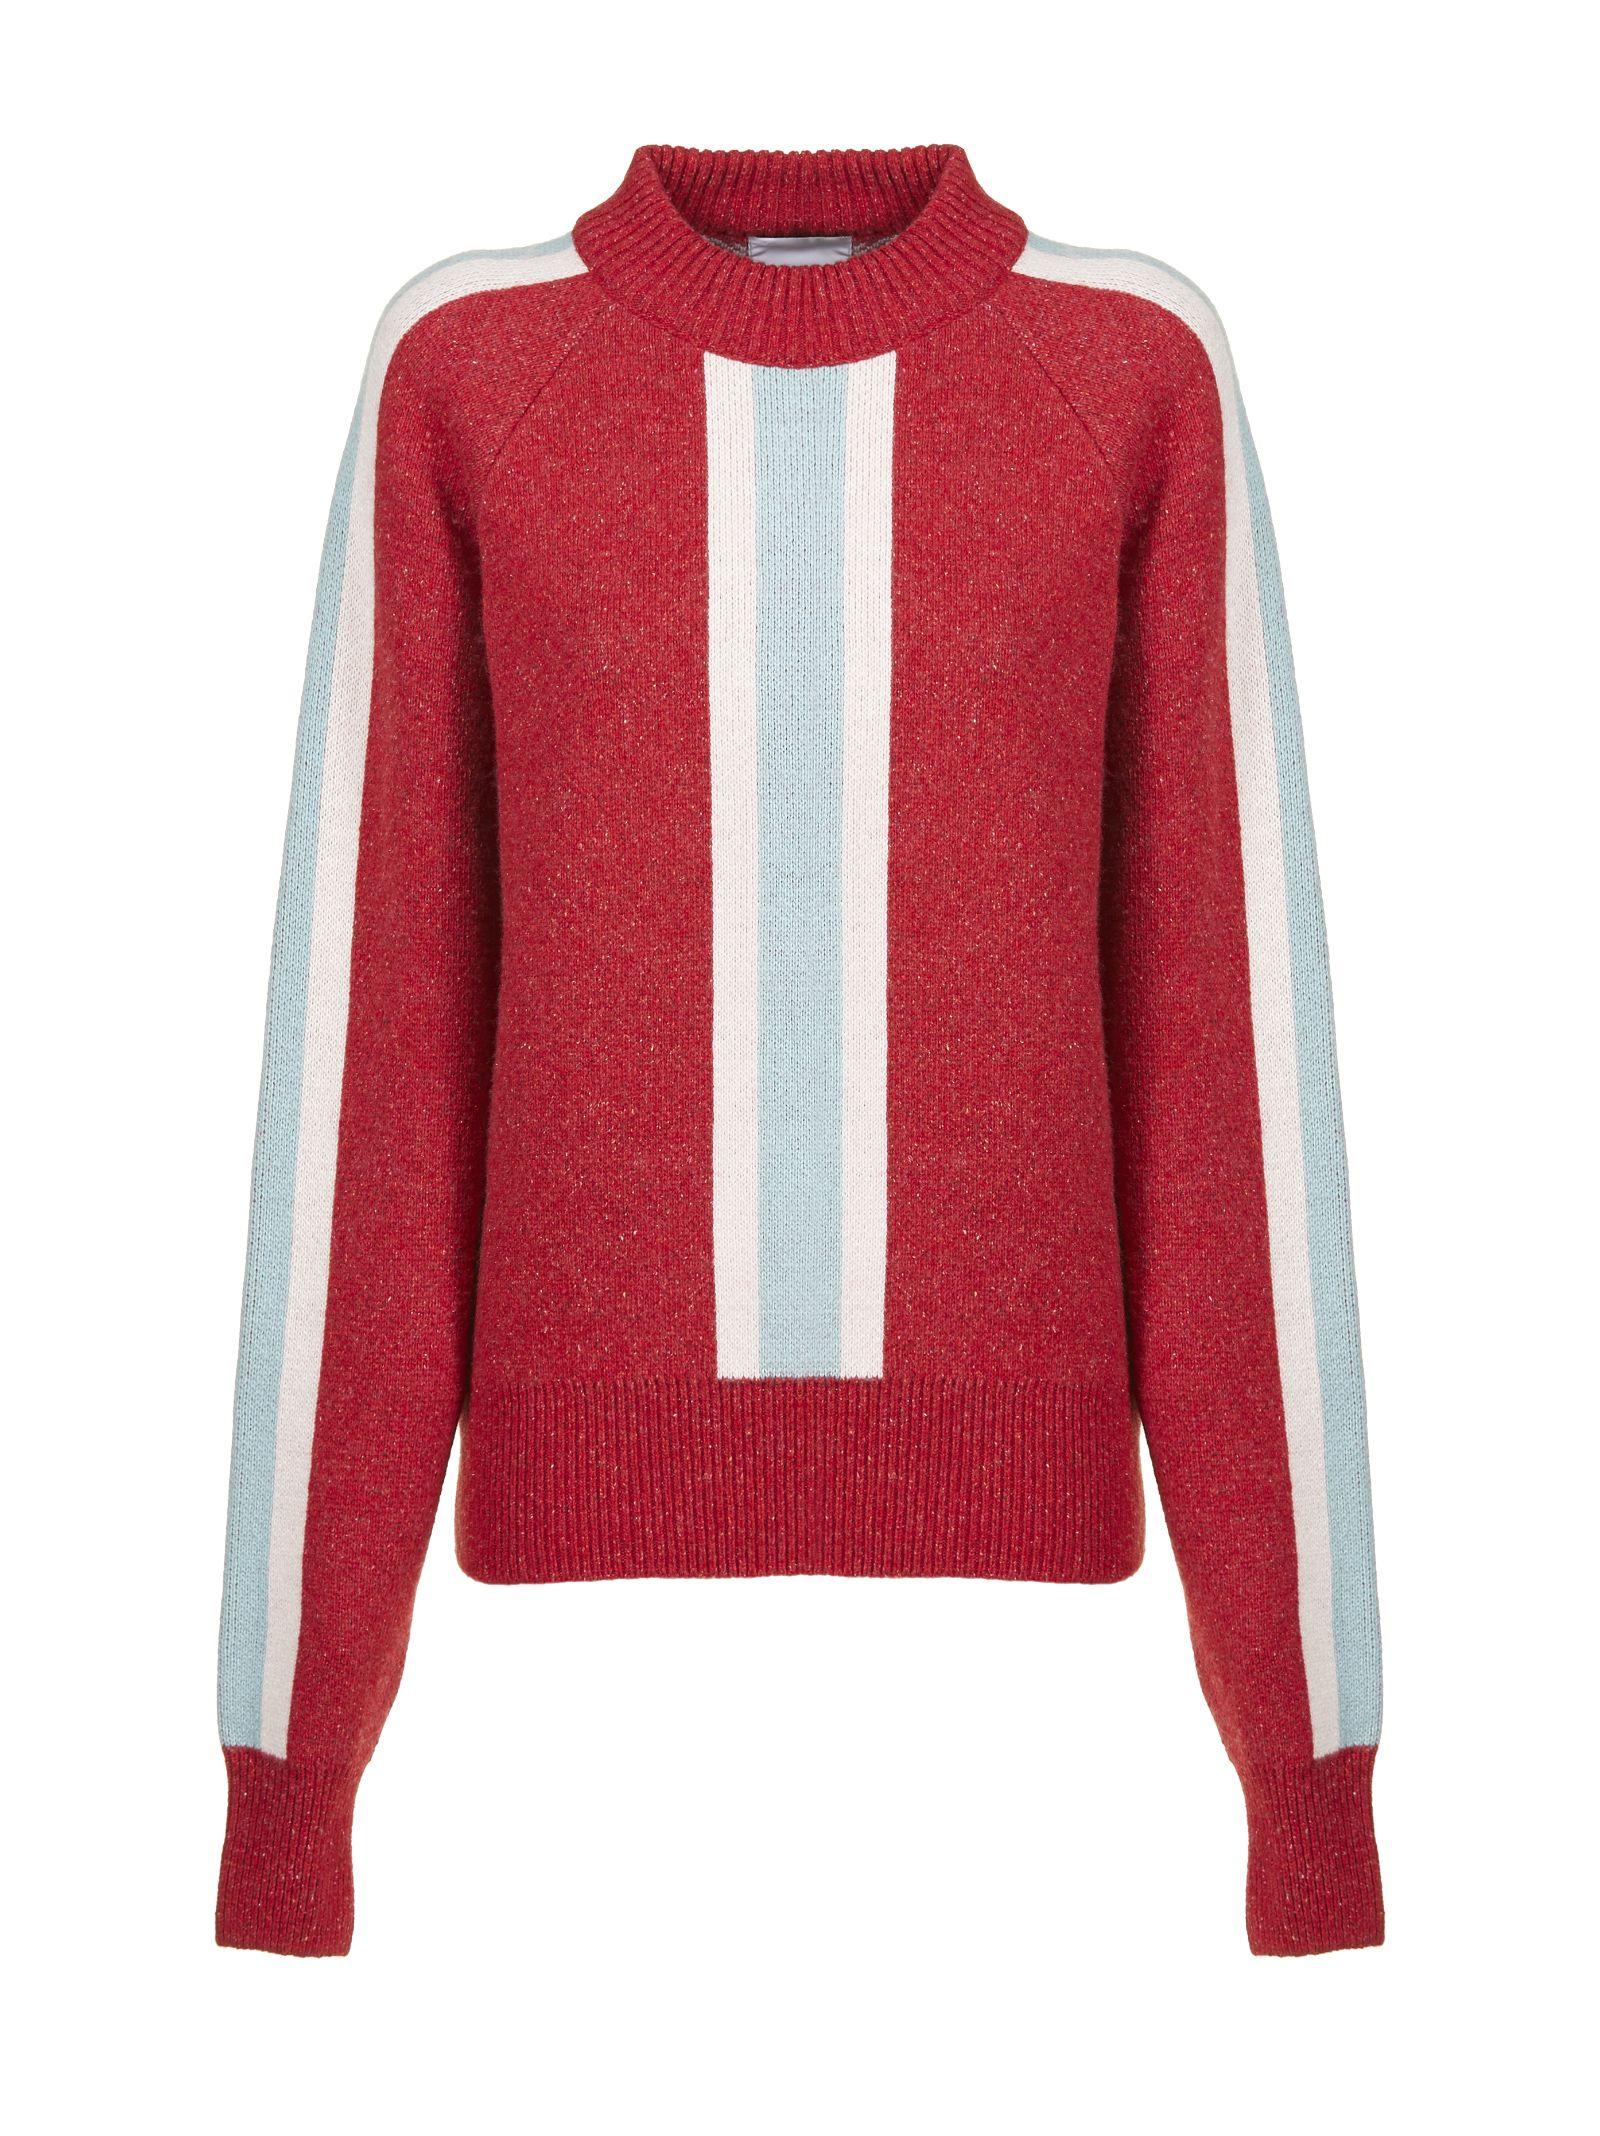 Valentine Witmeur Leaderish Sweater